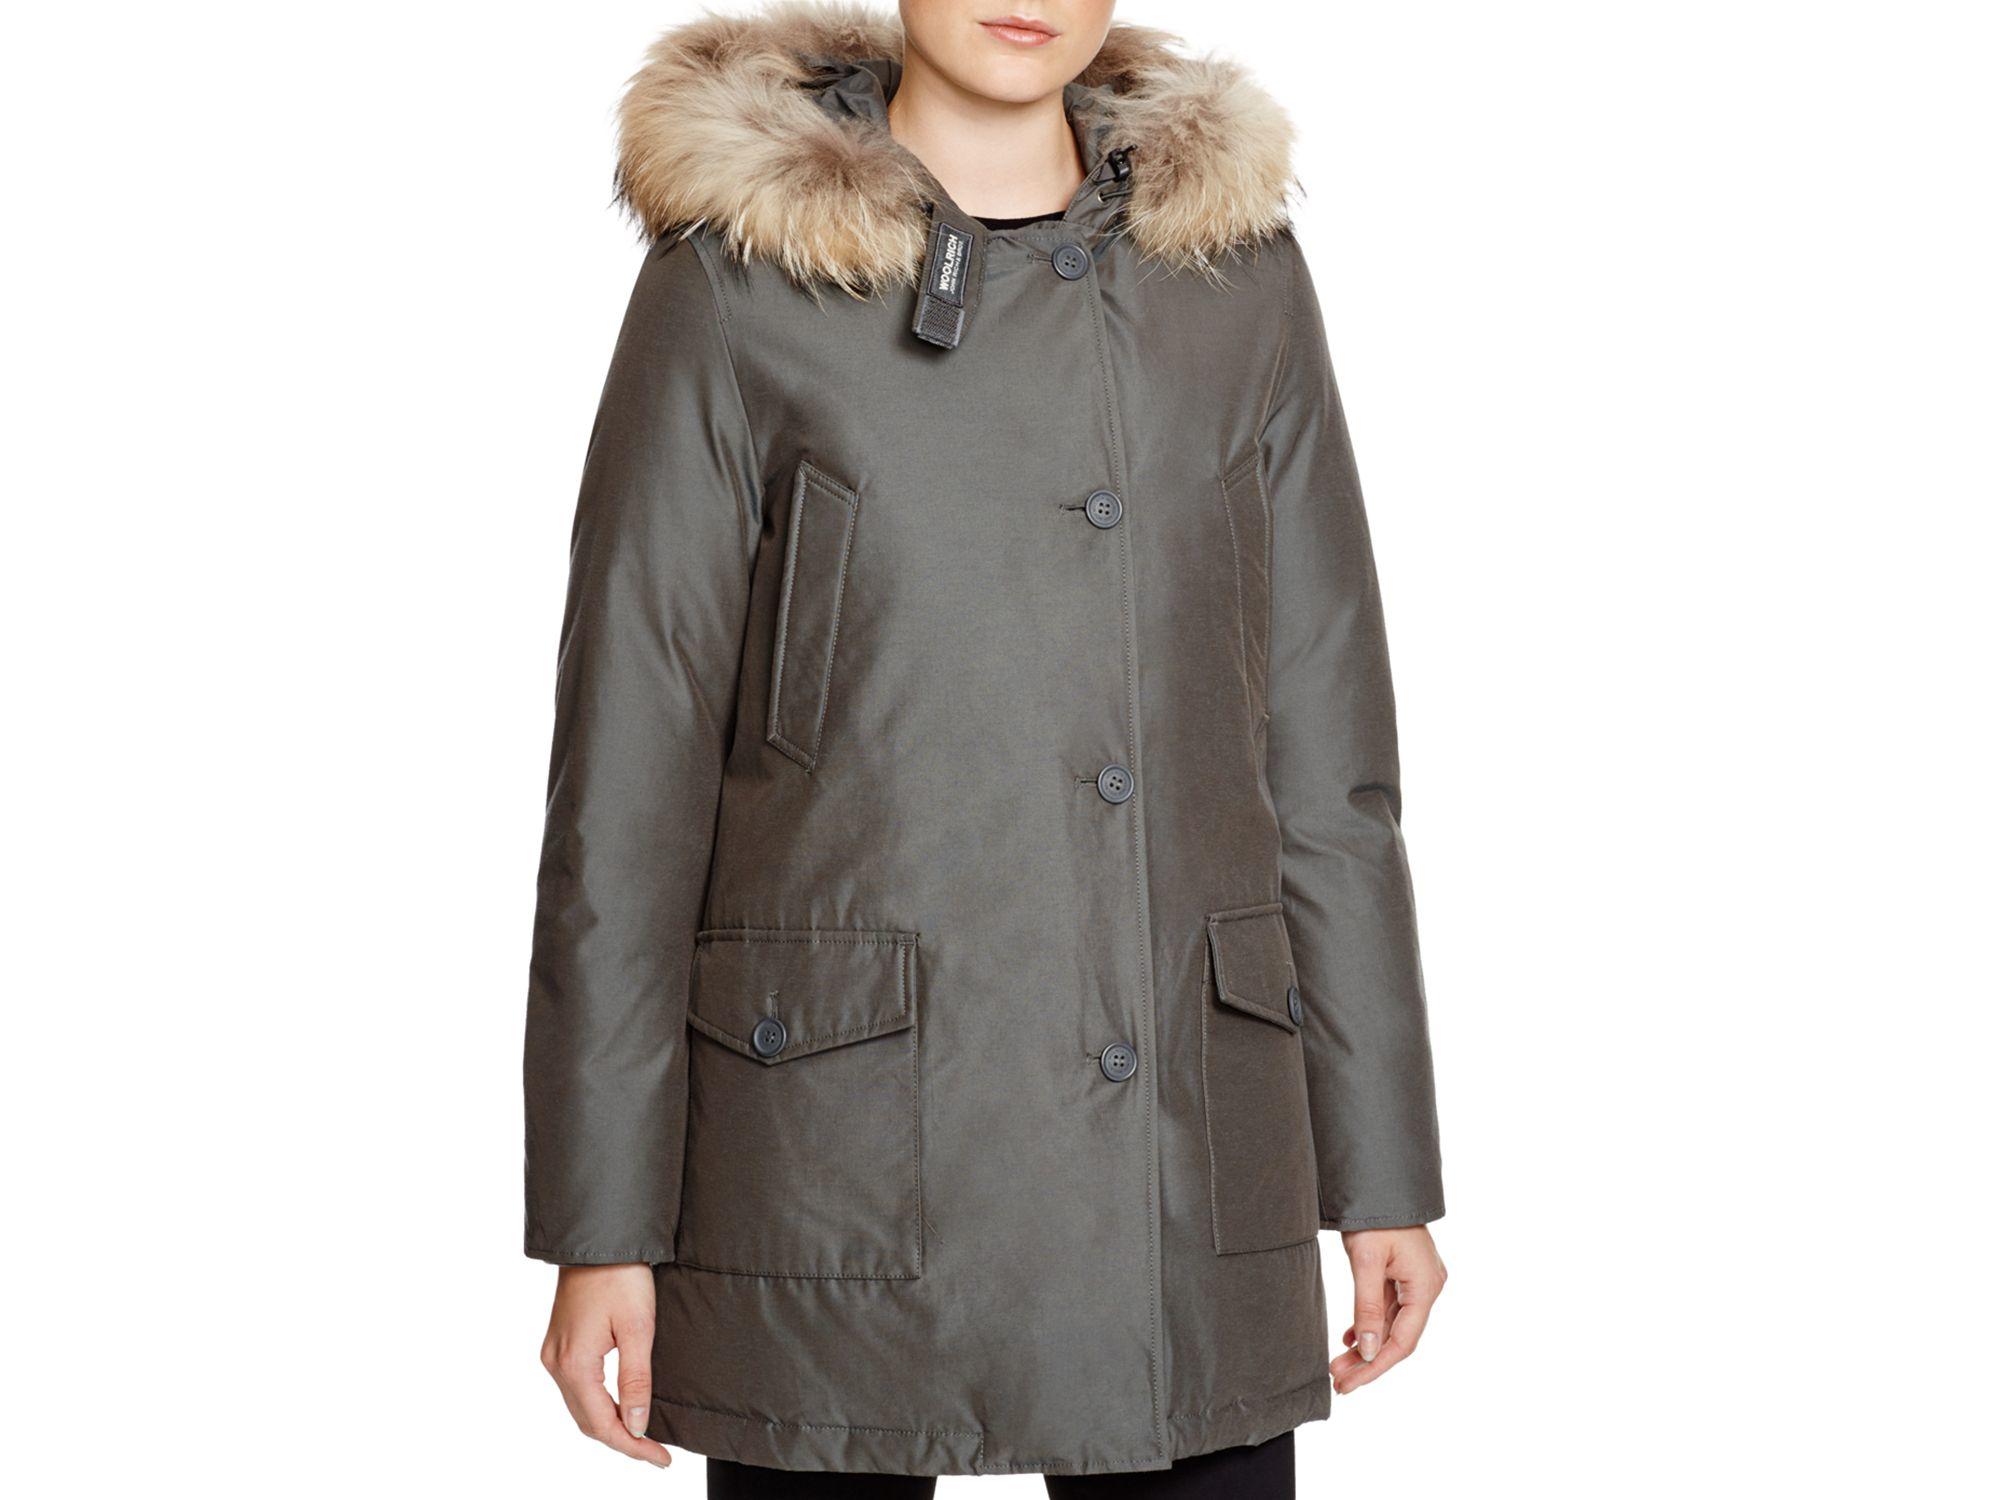 woolrich arctic fur trim parka in natural lyst. Black Bedroom Furniture Sets. Home Design Ideas